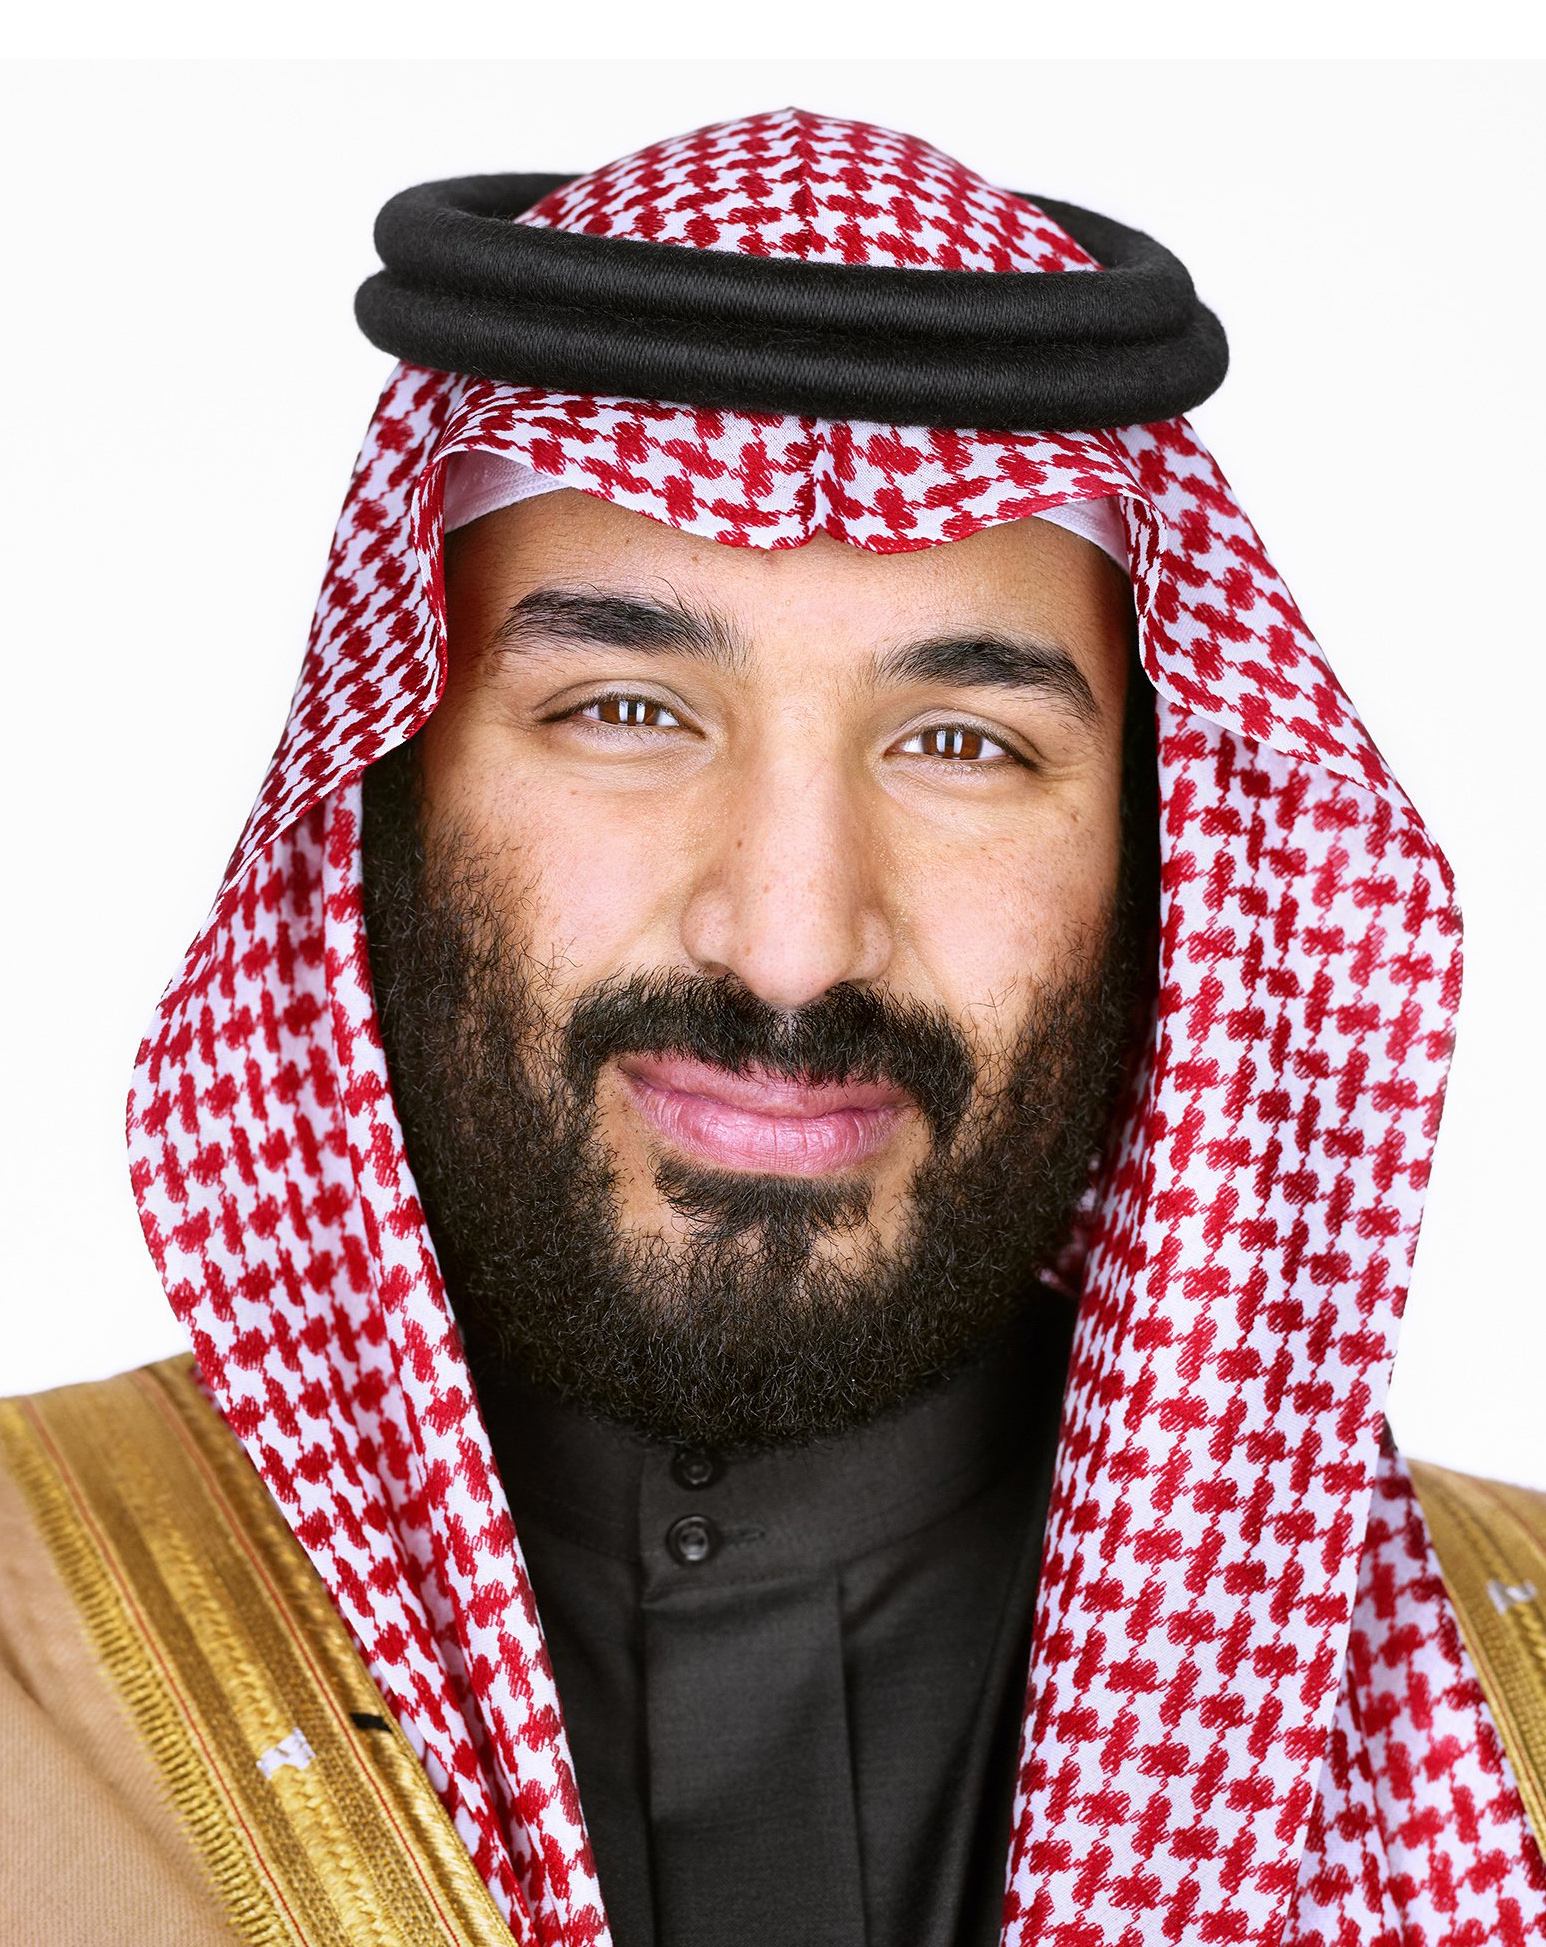 Mohammad bin Salman of Saudi Arabia